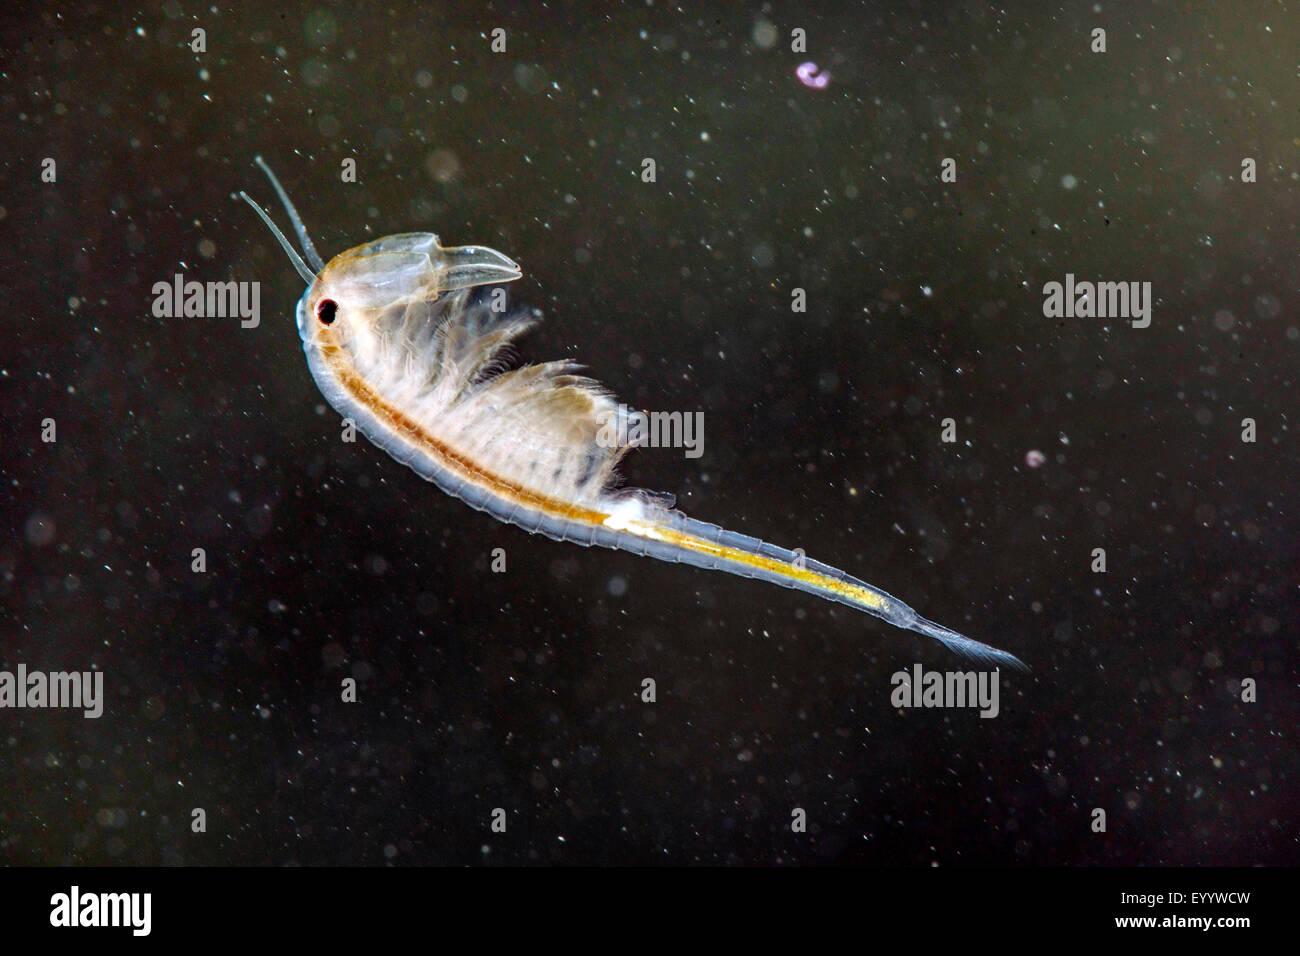 macrocrustacean, Anostraca (Branchinecta orientalis), swimming male - Stock Image